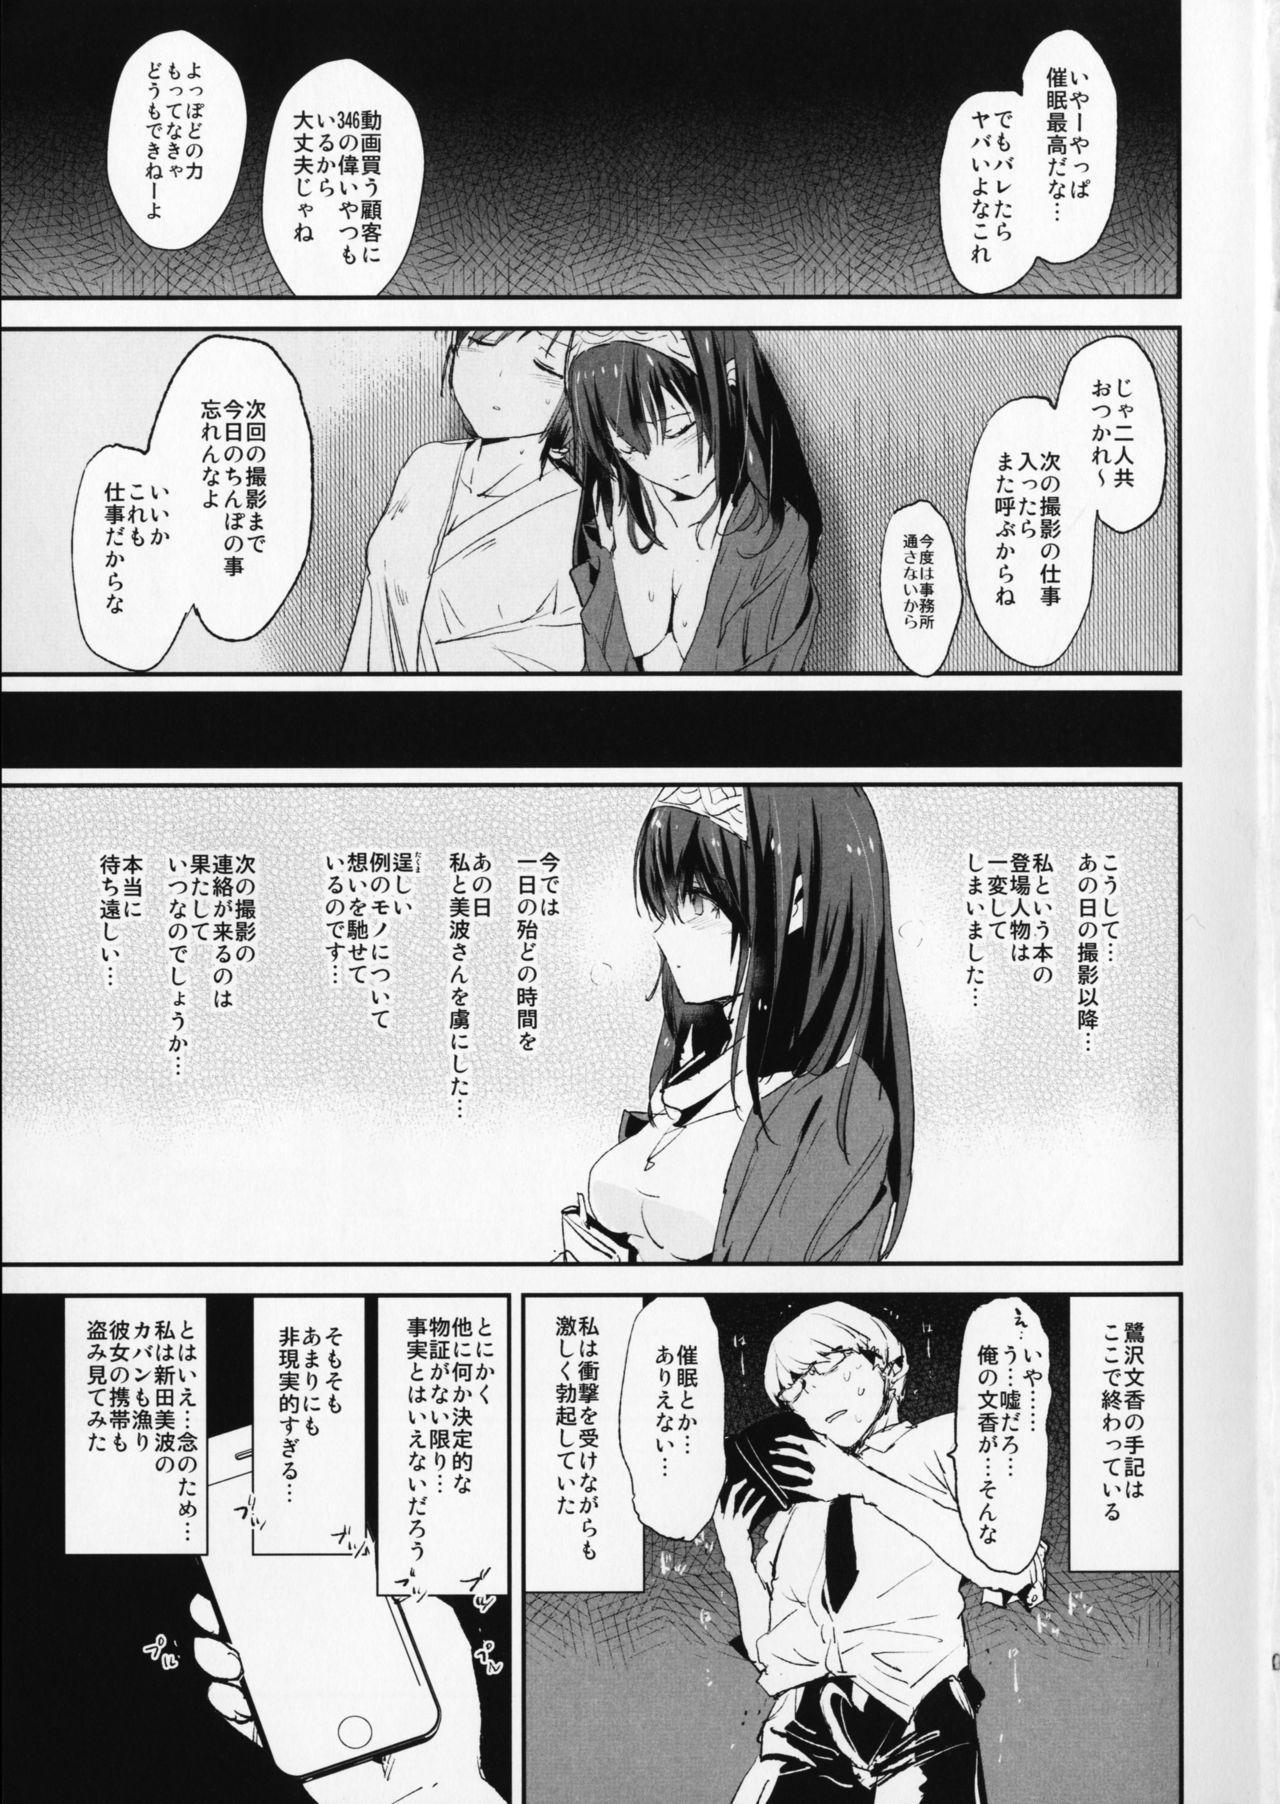 (C91) [Yami ni Ugomeku (Dokurosan)] Sagisawa Fumika no Saimin Dosukebe Kansoubun (with Nitta Minami) + Omake Paper (THE IDOLM@STER CINDERELLA GIRLS) 21